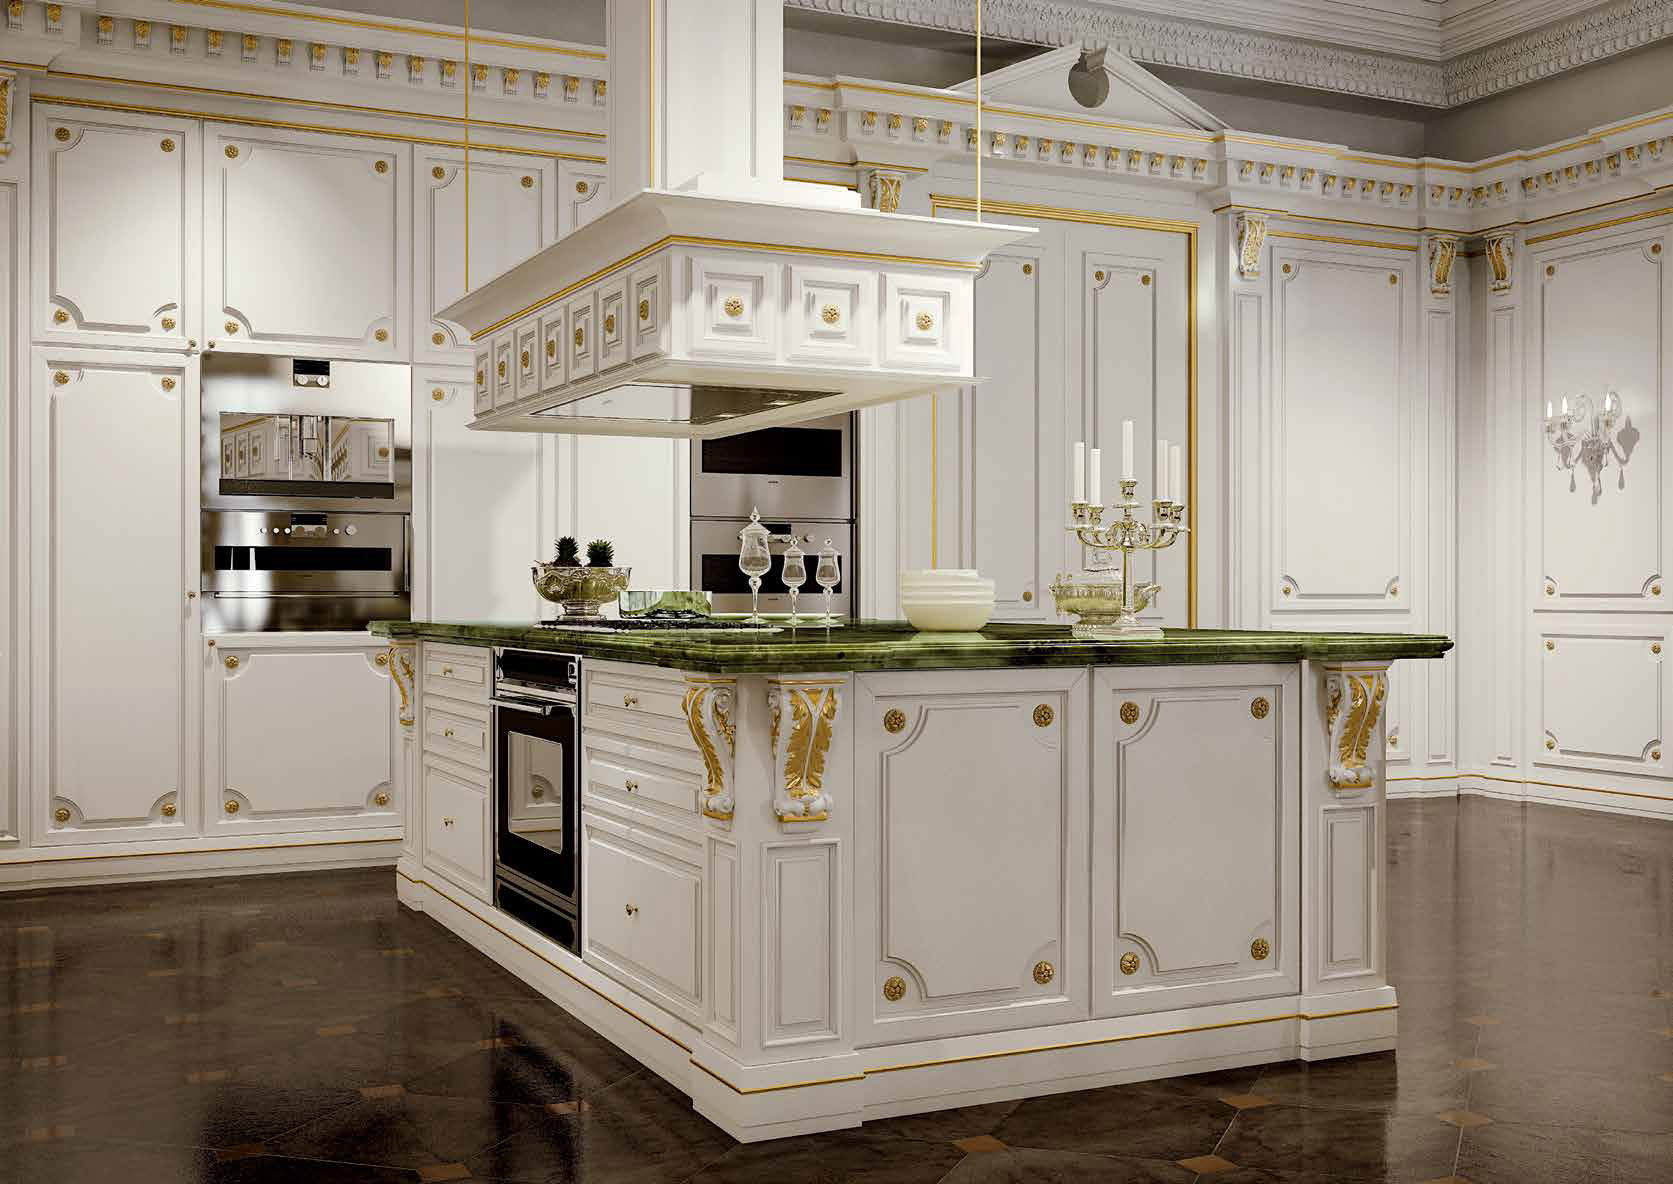 آشپزخانه, کلاسیک, لاکچری